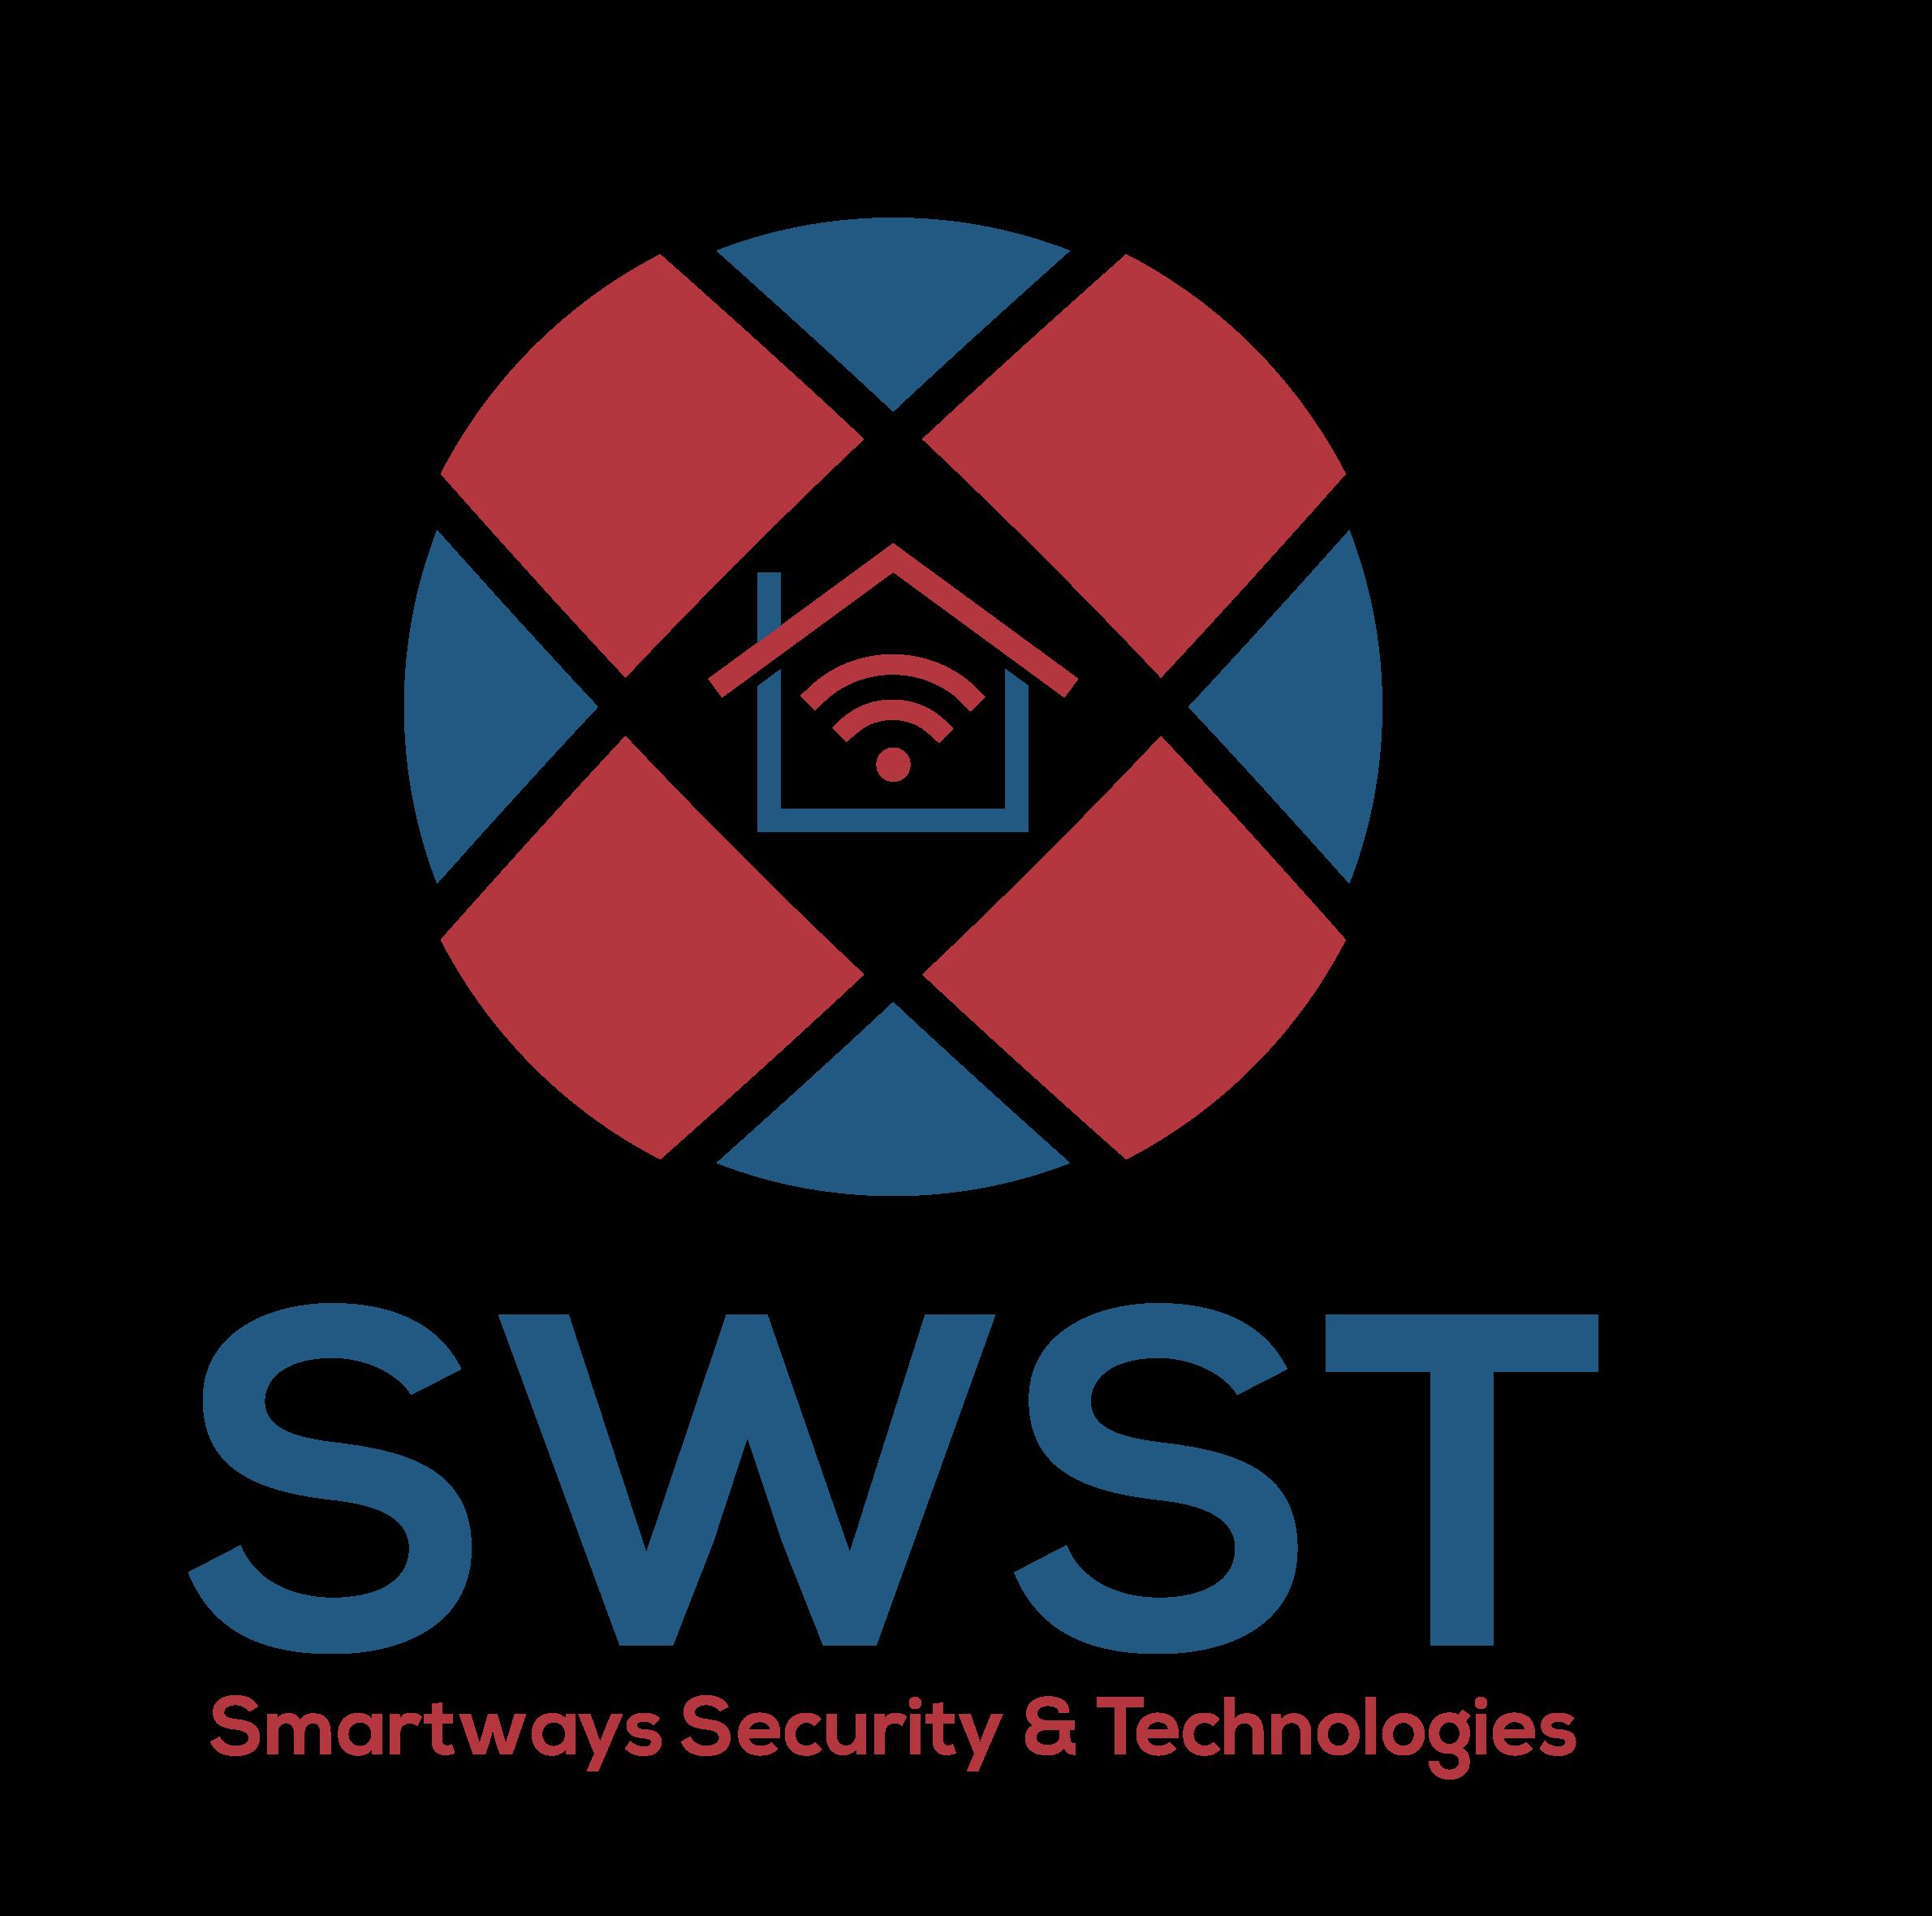 Smartways Security & Technologies